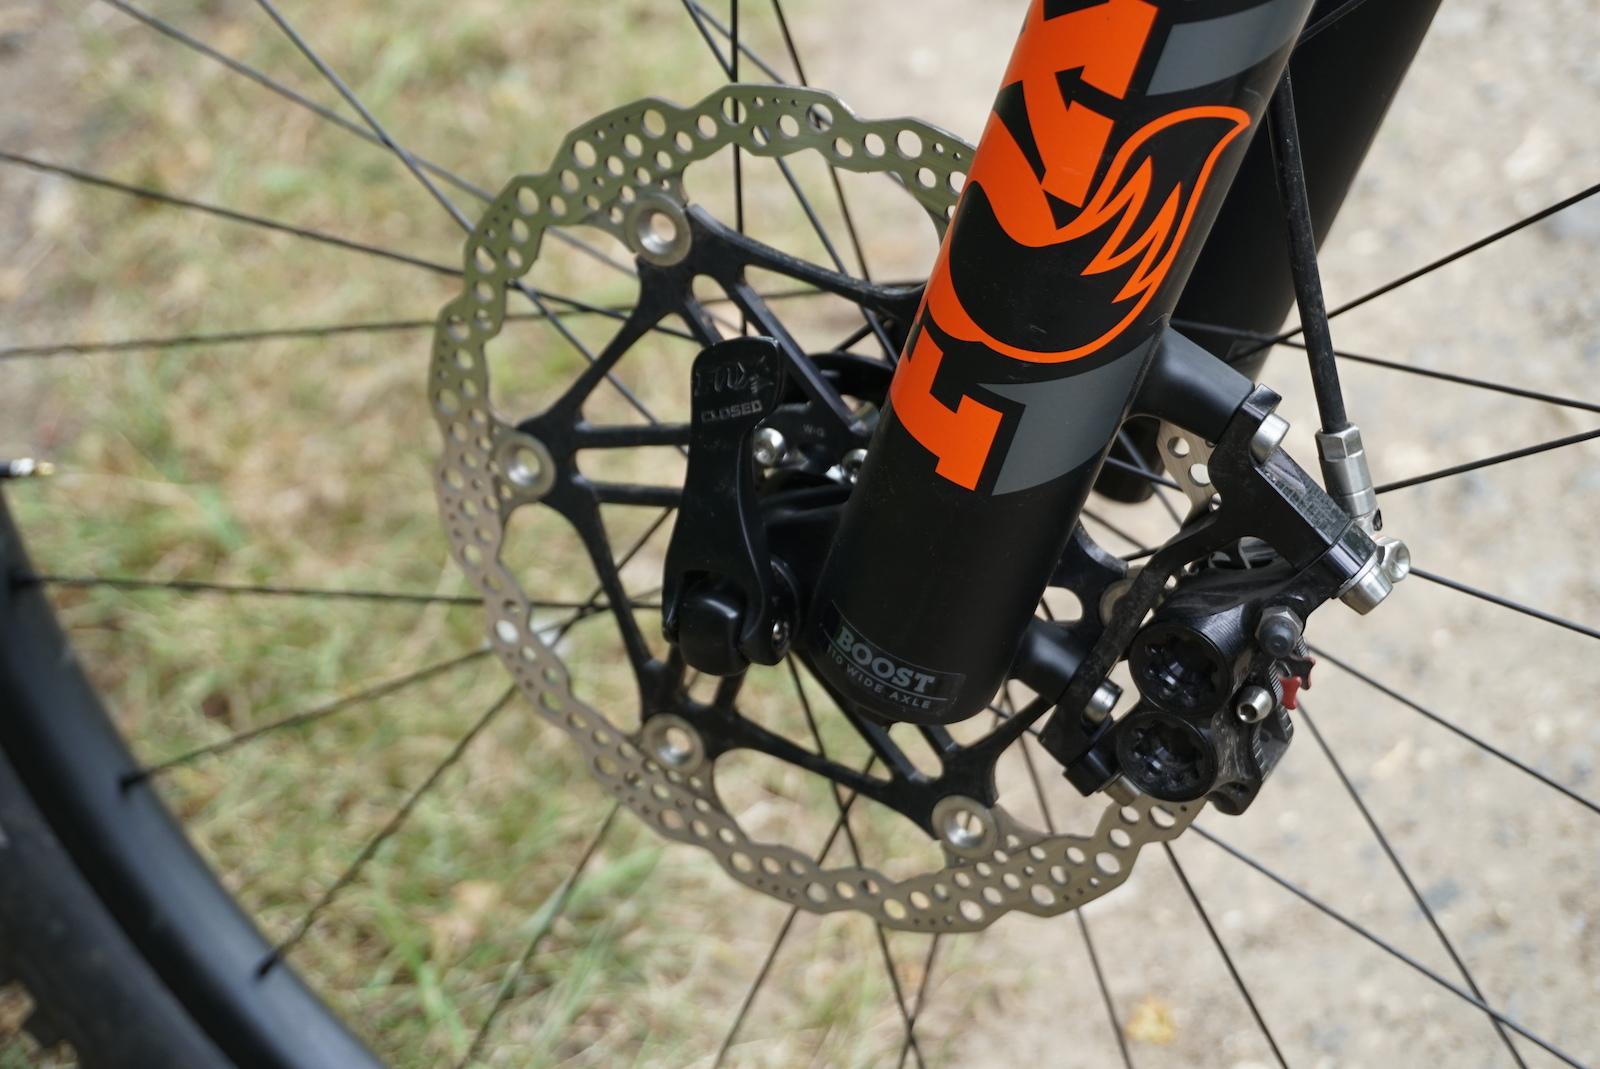 Hope Race Evo E4 disc brakes